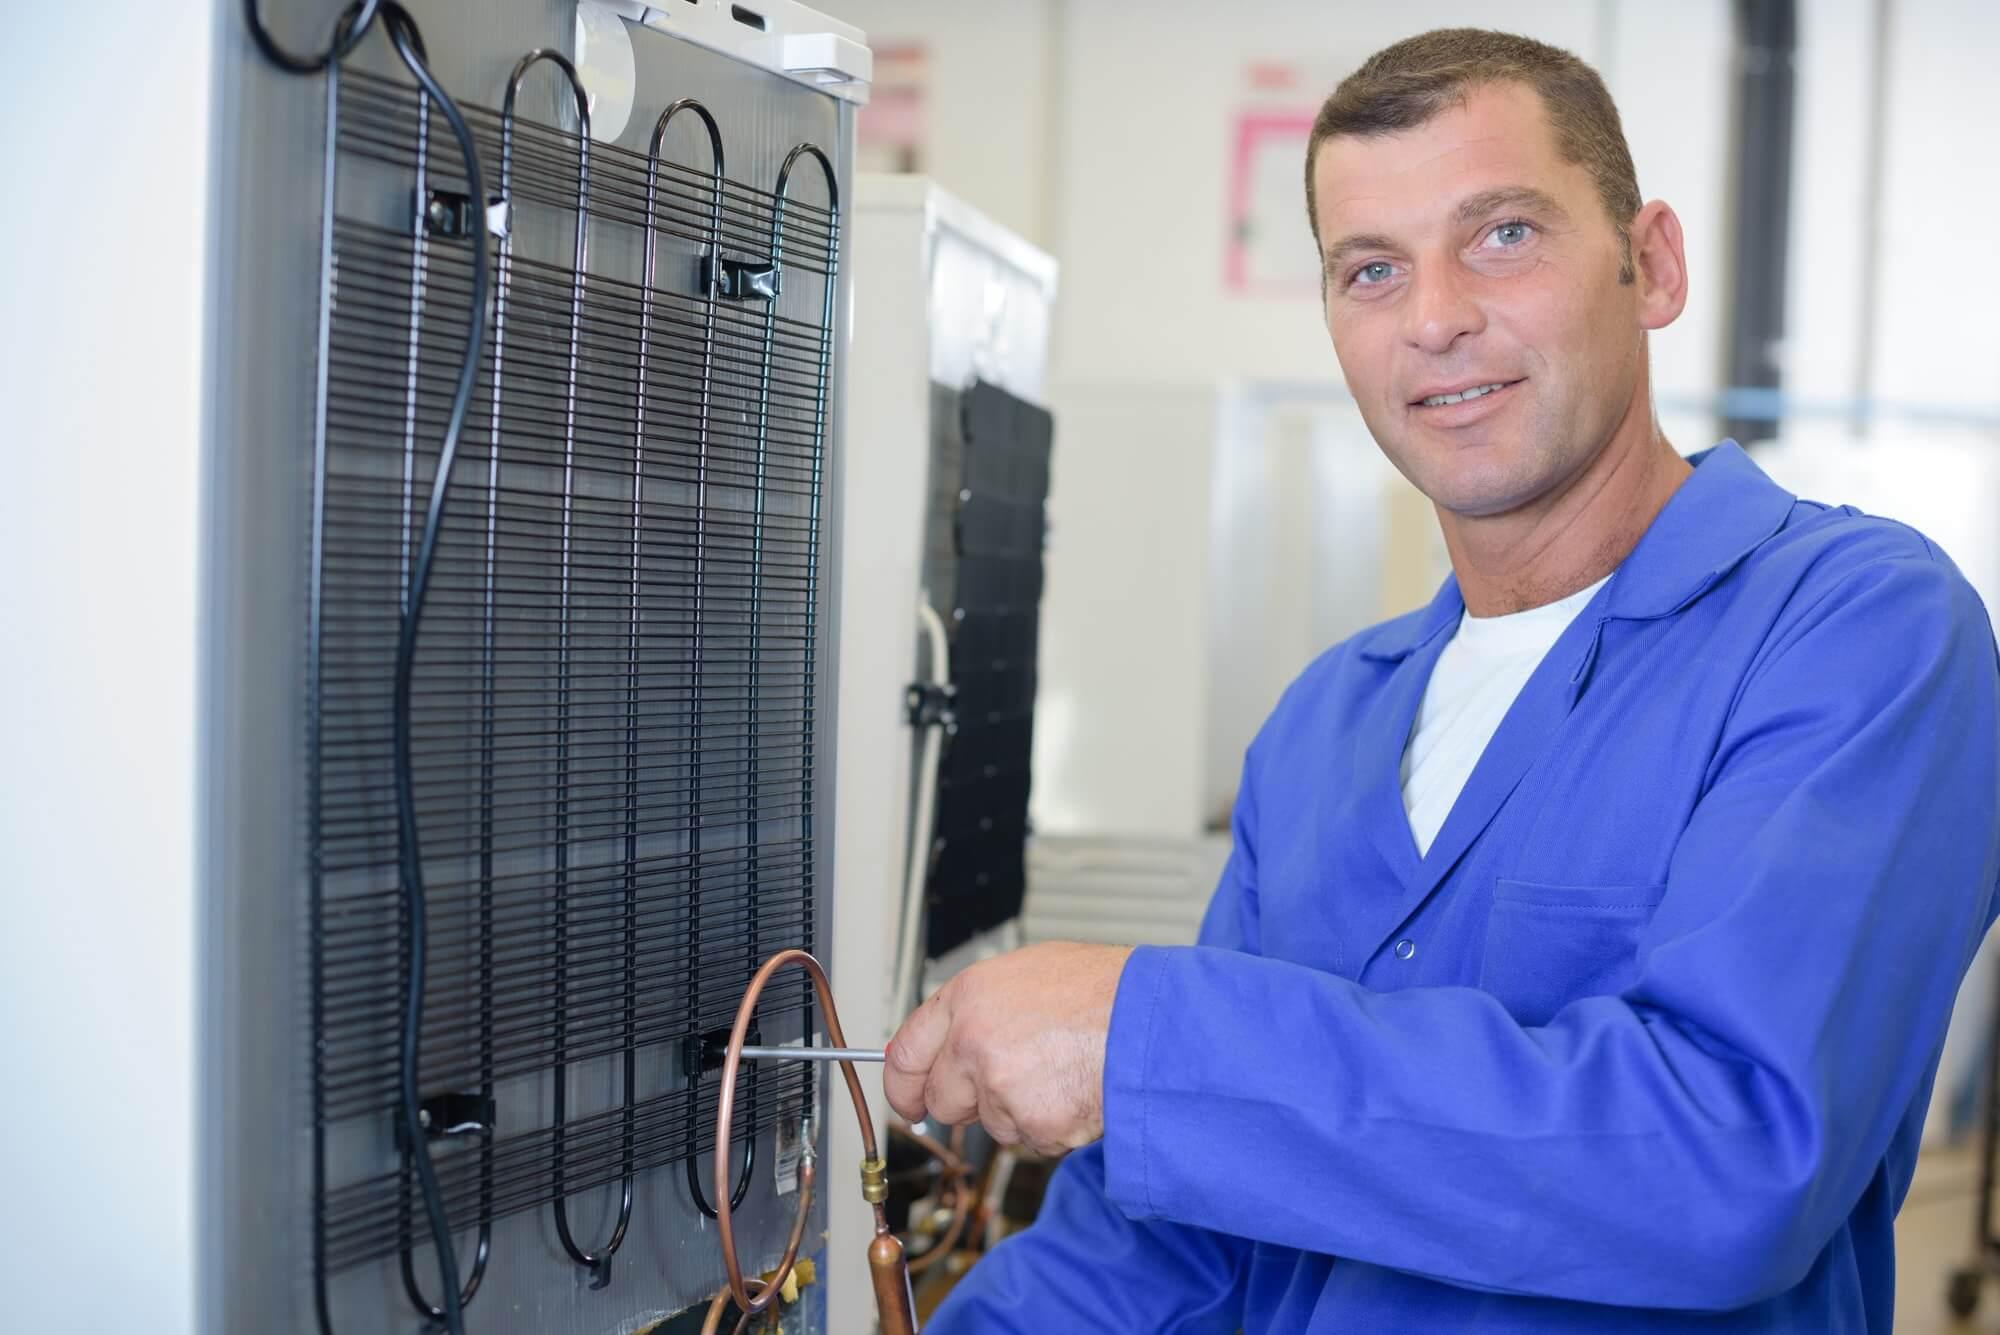 frigoriste-emploi-avenir